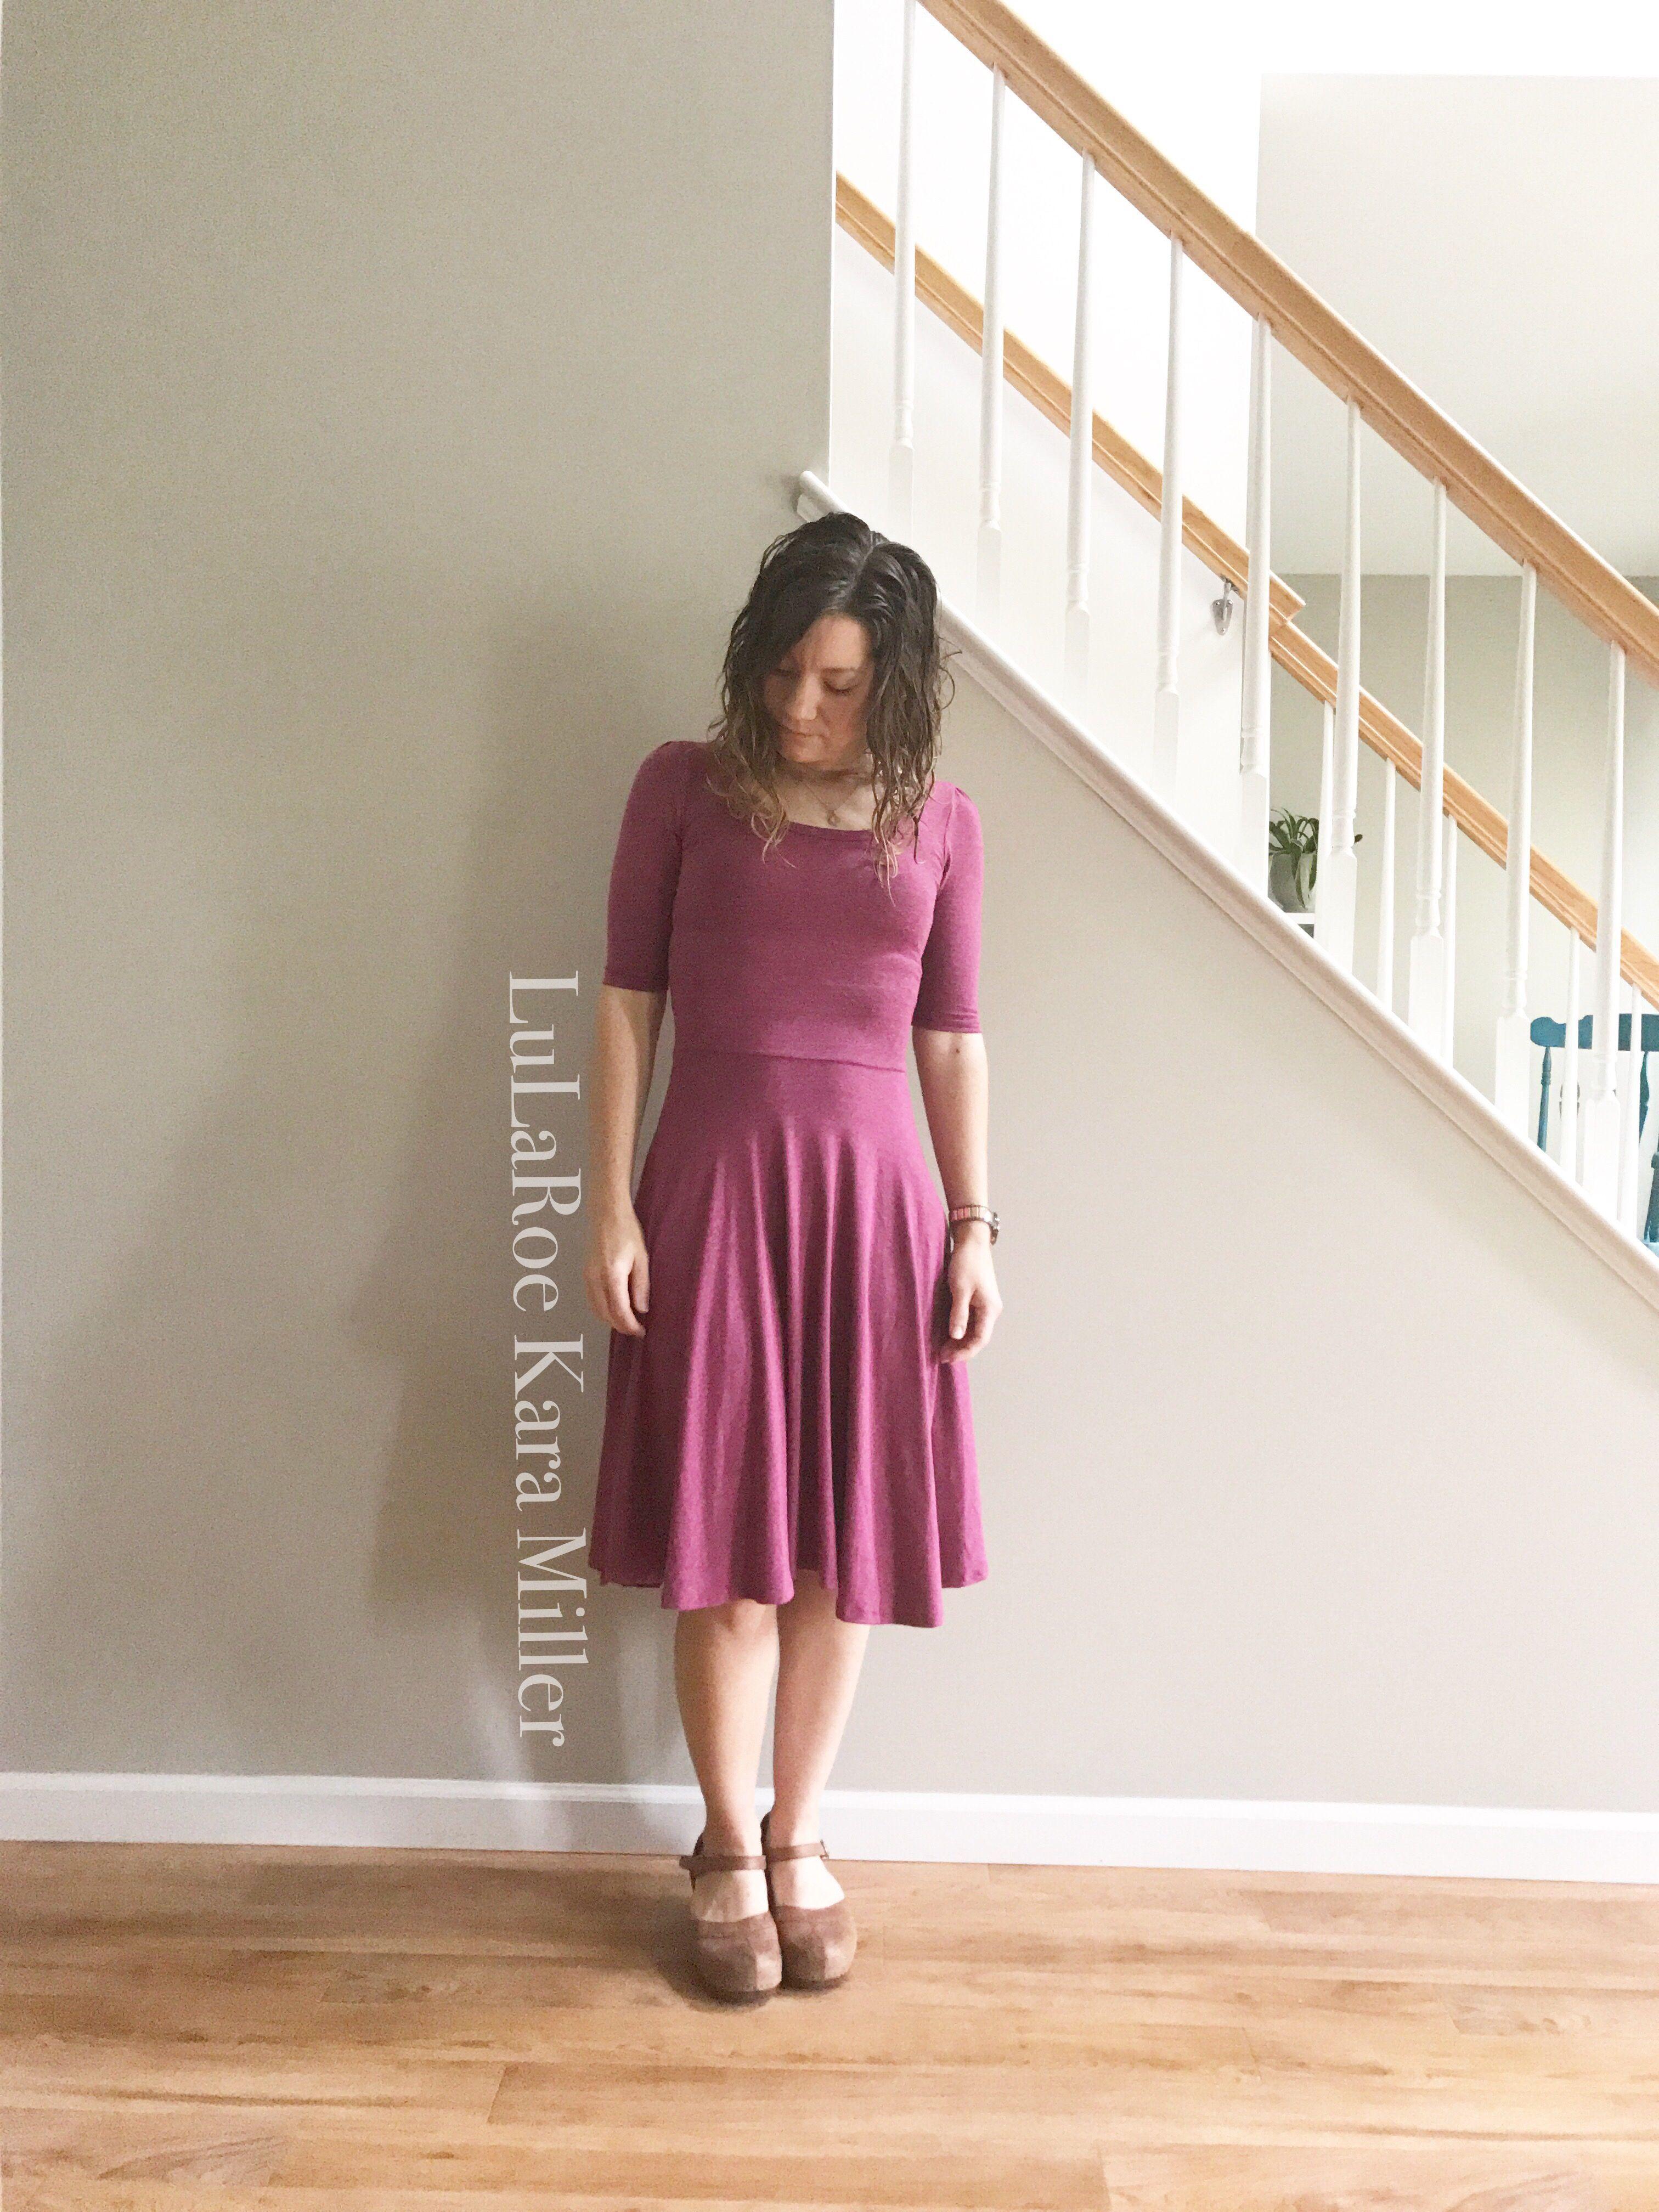 LuLaRoe heathered Nicole dress with Dansko sandal clogs for summer fashion trends and style inspiration!  Shop here: https://www.facebook.com/groups/LularoeKaraMiller/